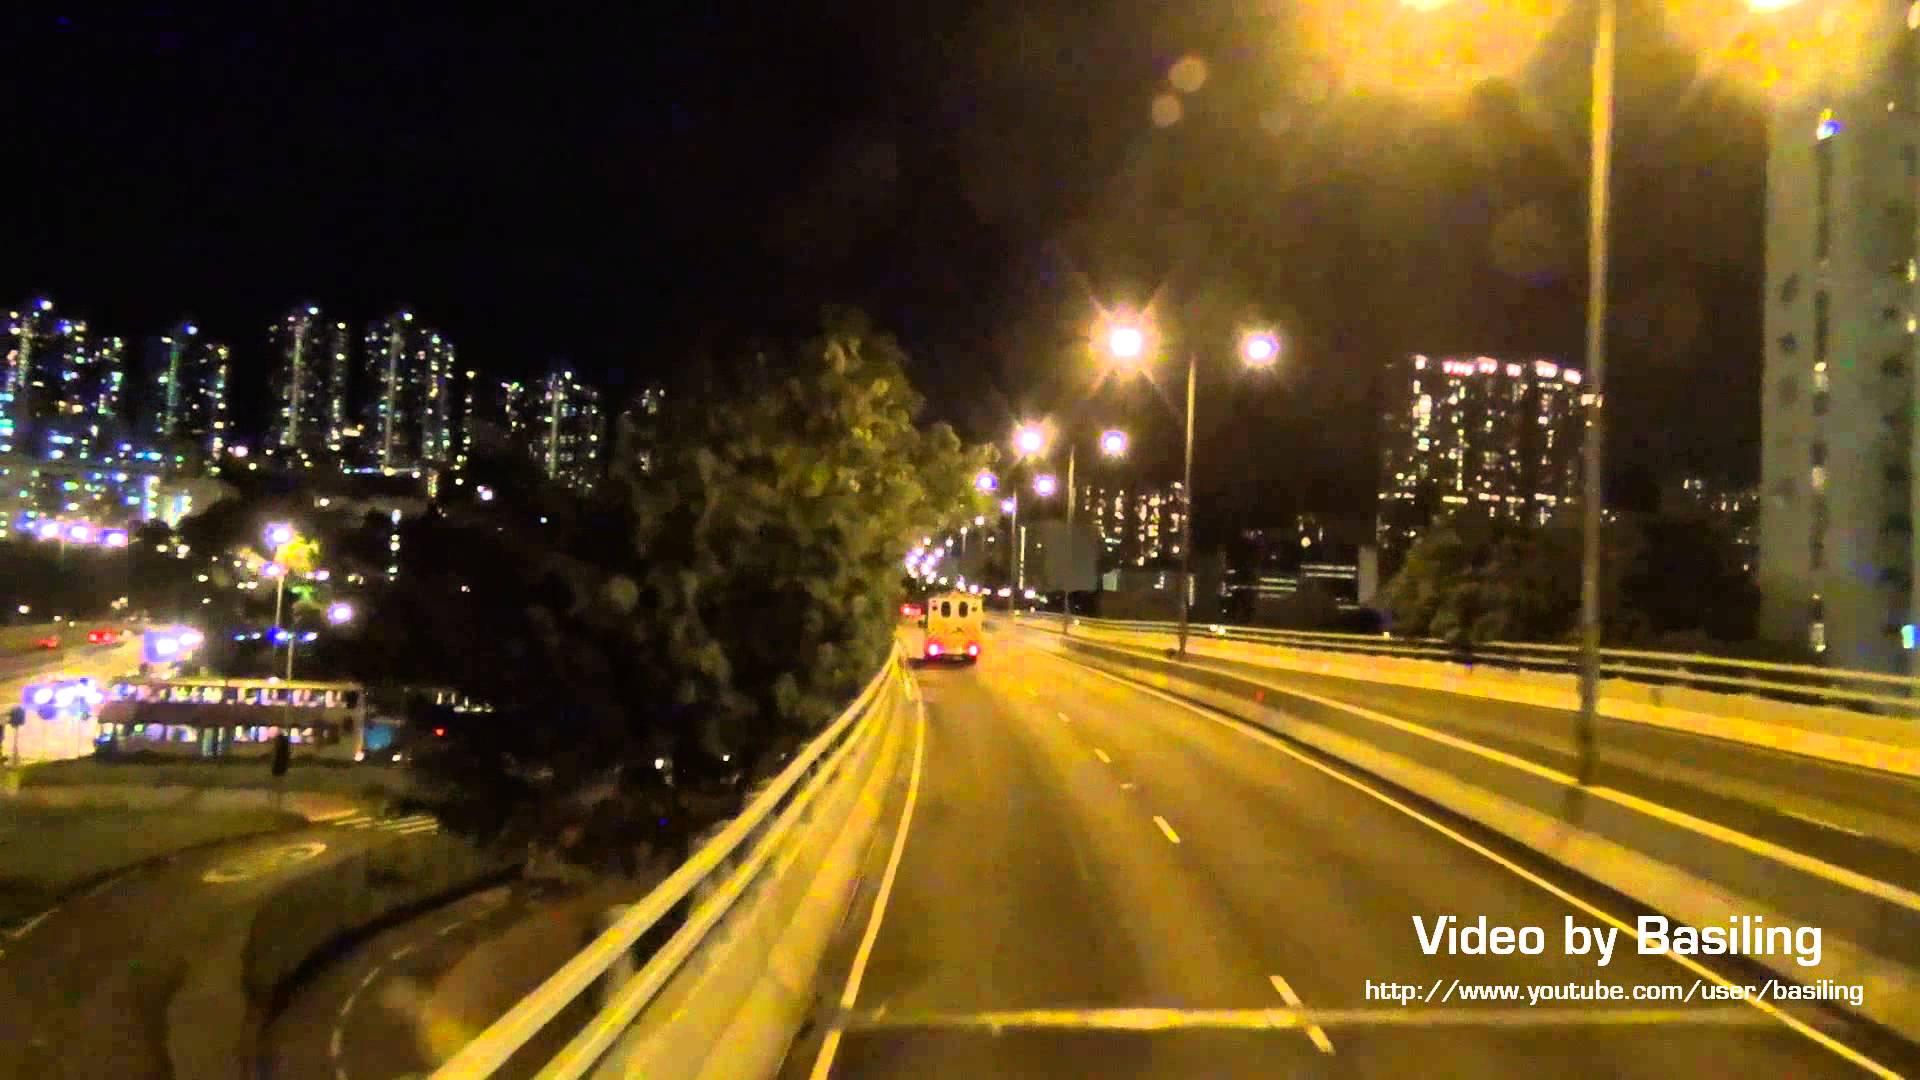 Hong Kong Bus KMB AVBWU31 @ 271 九龍巴士 Volvo B9 基督中心堂-大埔廣福道